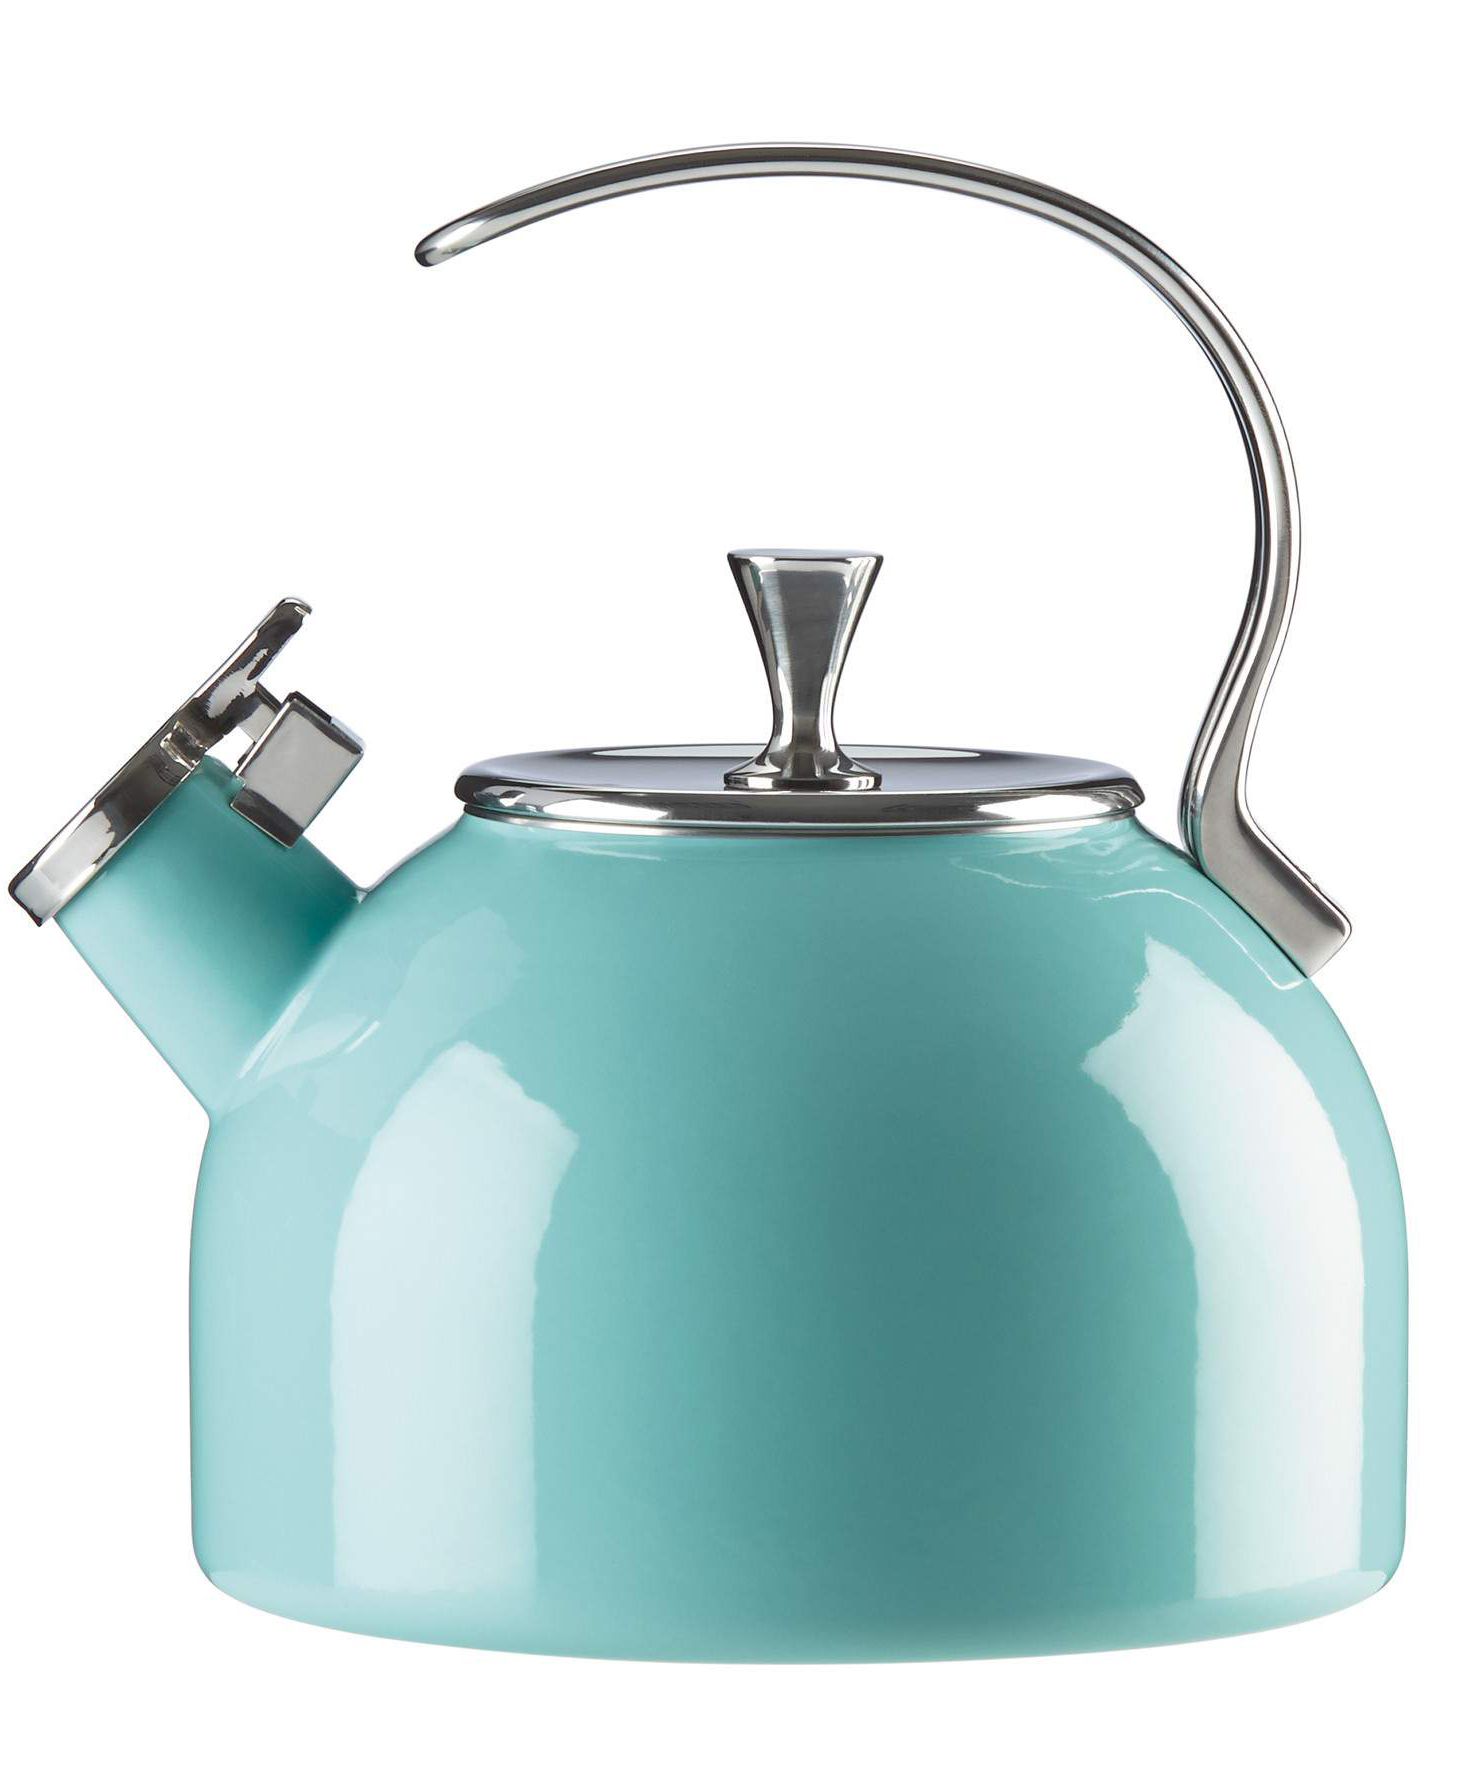 Kate Spade Turquoise Tea Kettle